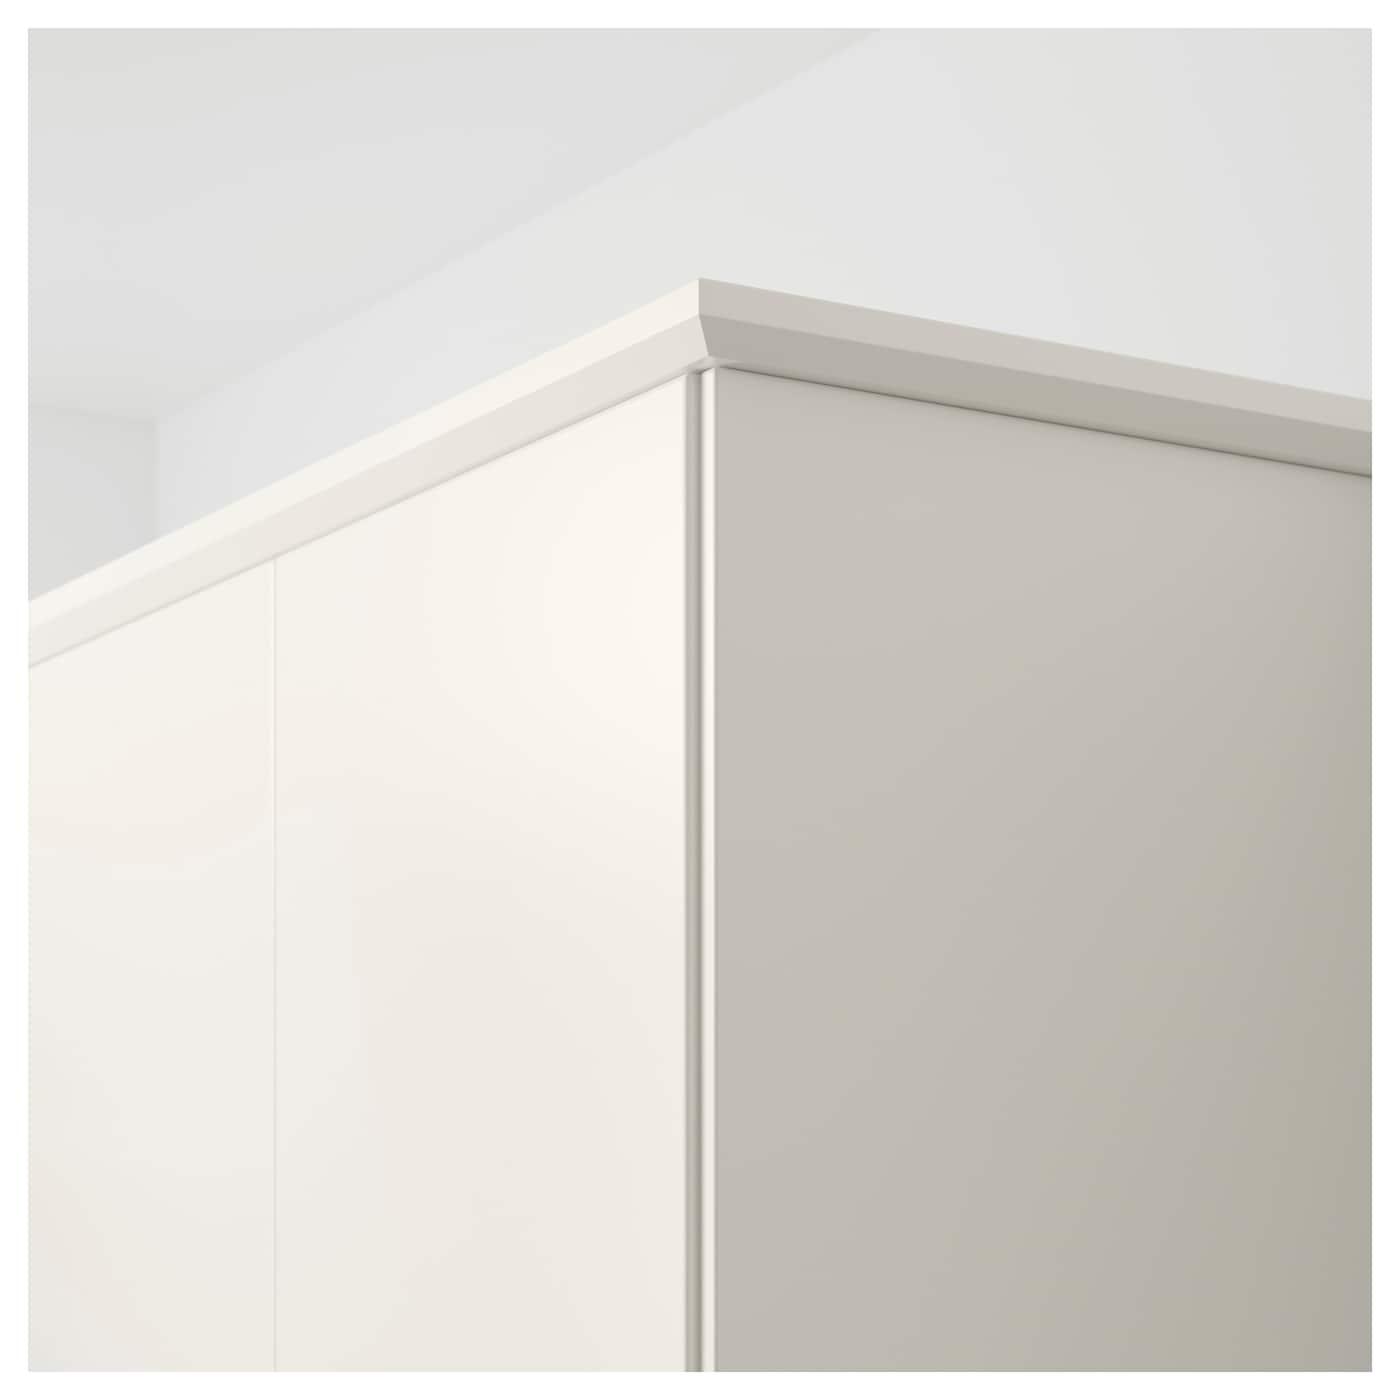 f rb ttra bandeau d cor chanfrein blanc 221 cm ikea. Black Bedroom Furniture Sets. Home Design Ideas